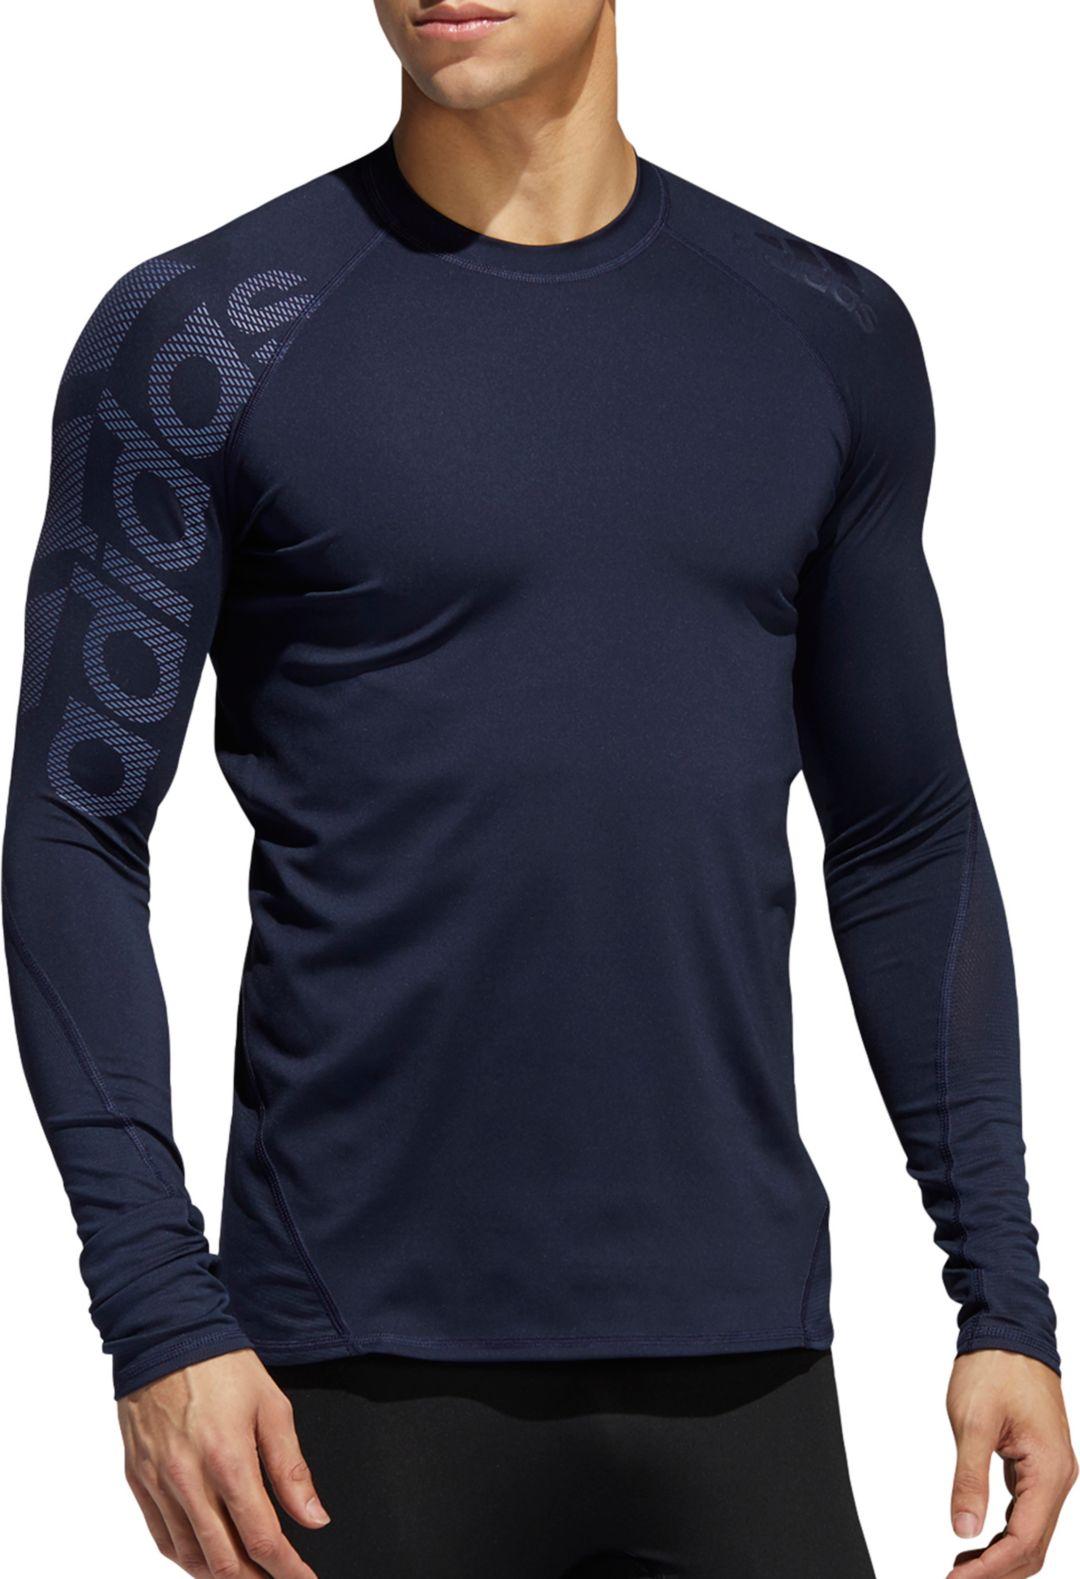 075a698e75098 adidas Men's Alphaskin Badge of Sport Logo Compression Long Sleeve Shirt